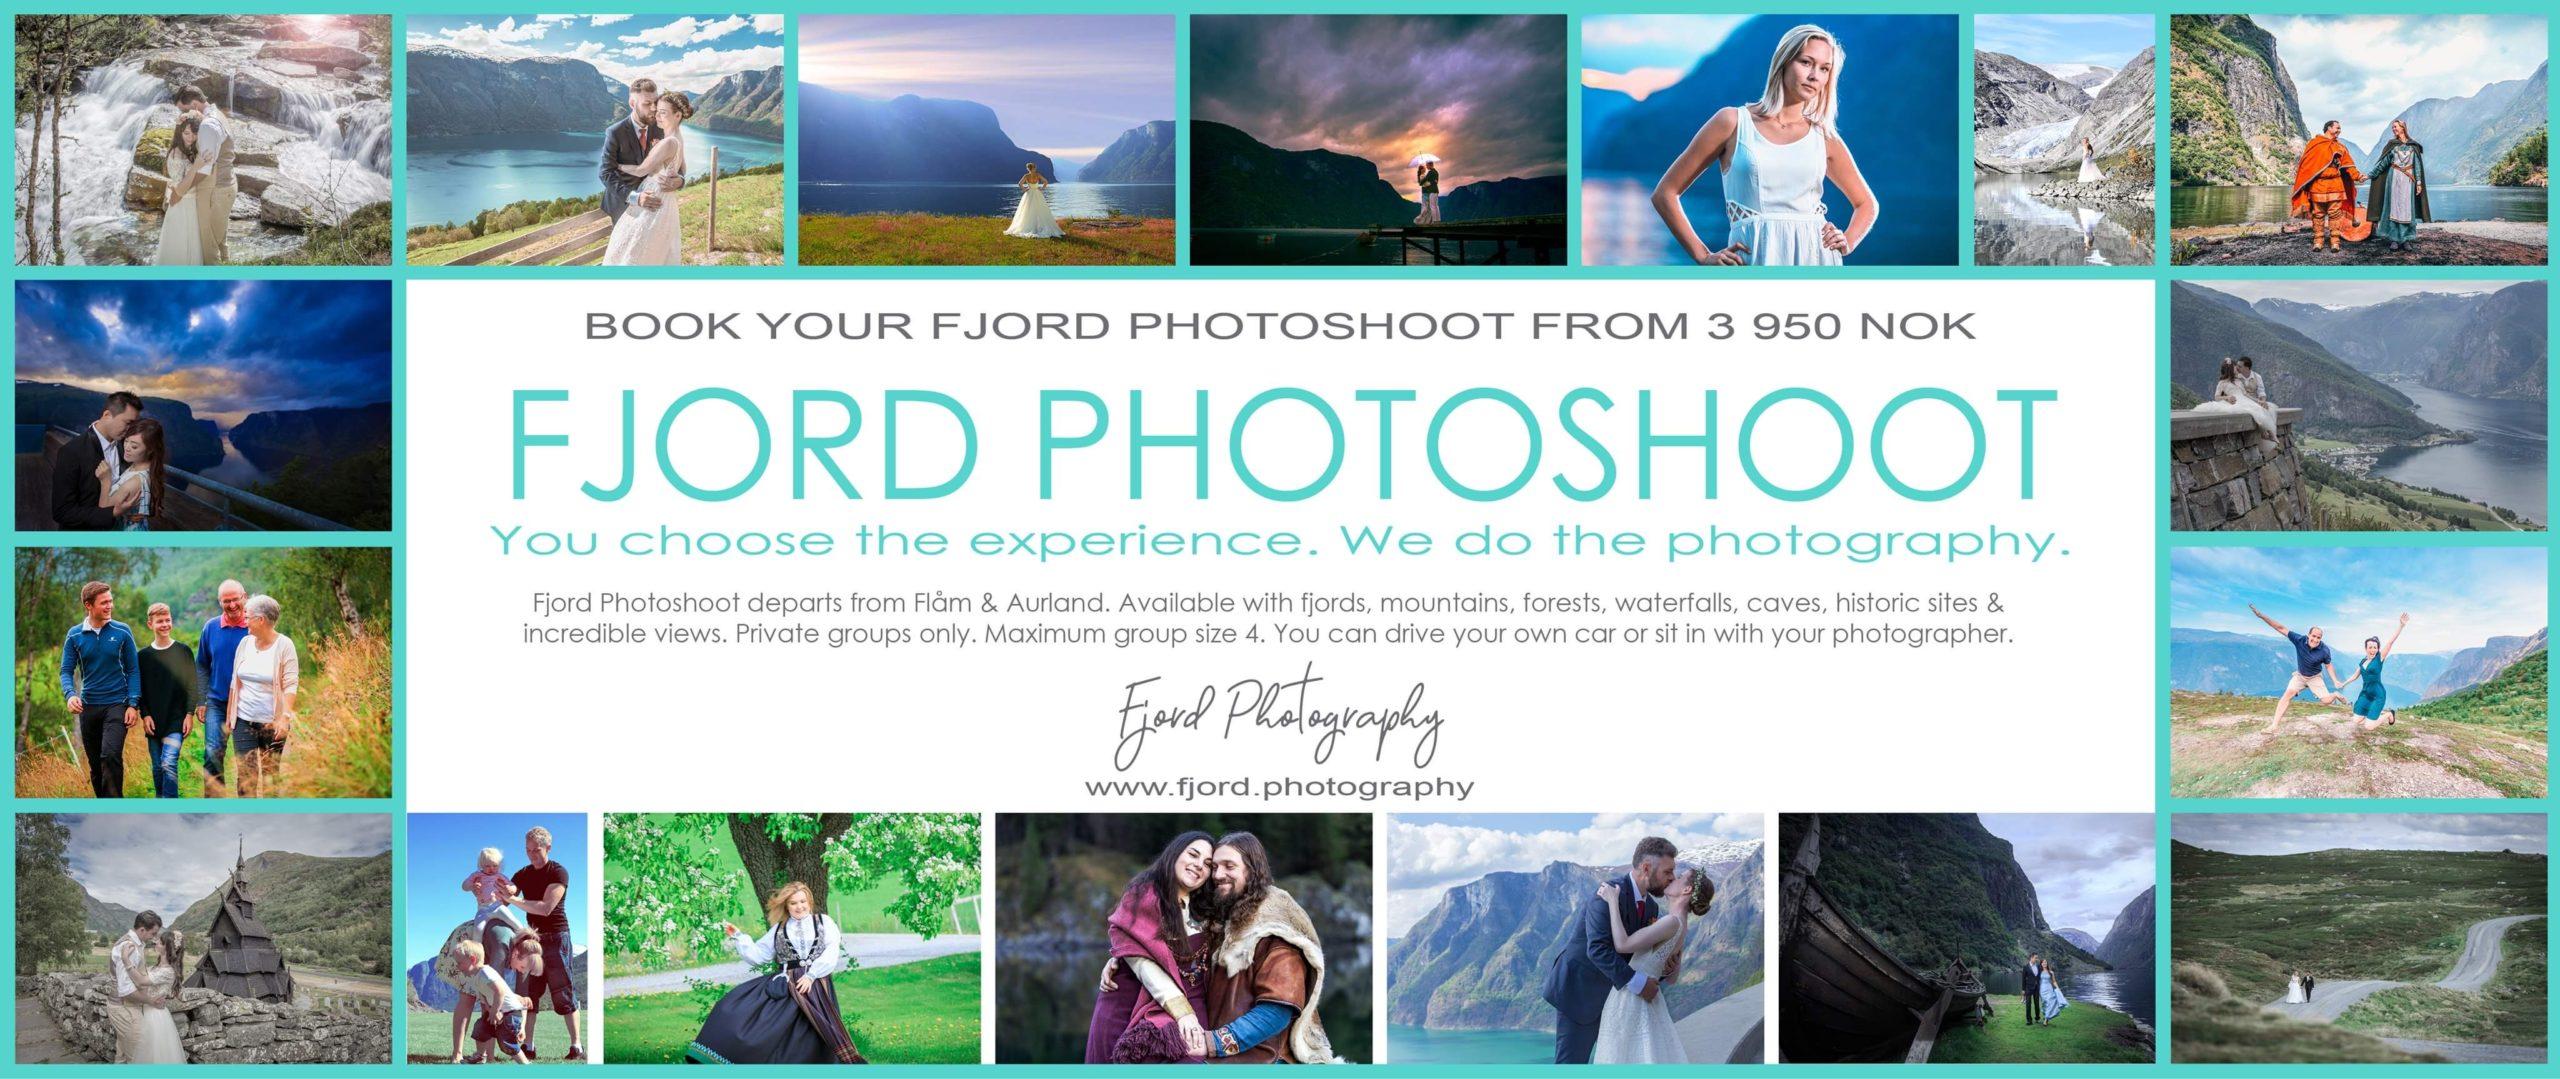 Fjord Photoshoot by Fjord Photography Paul Edmundson